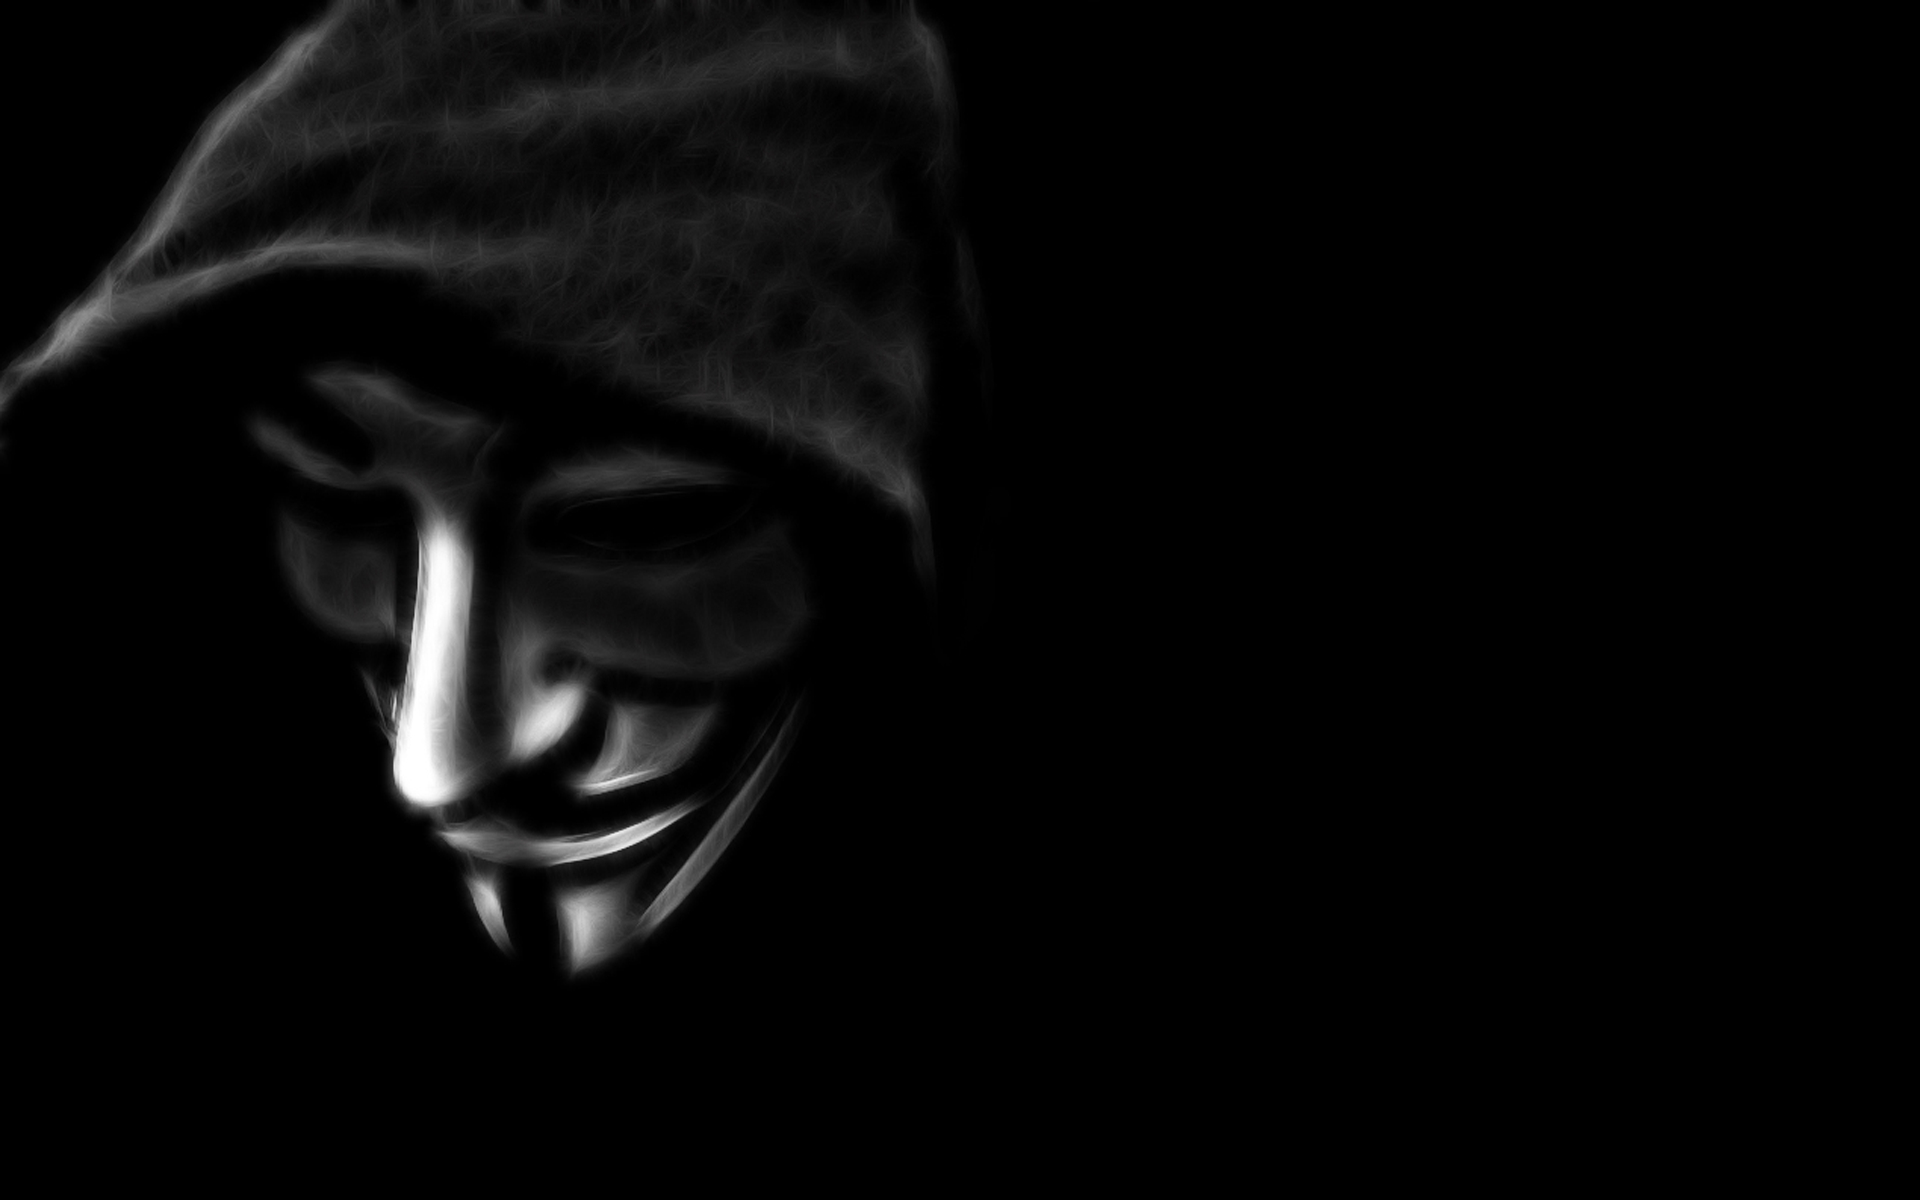 anonymous wallpapers hd | pixelstalk